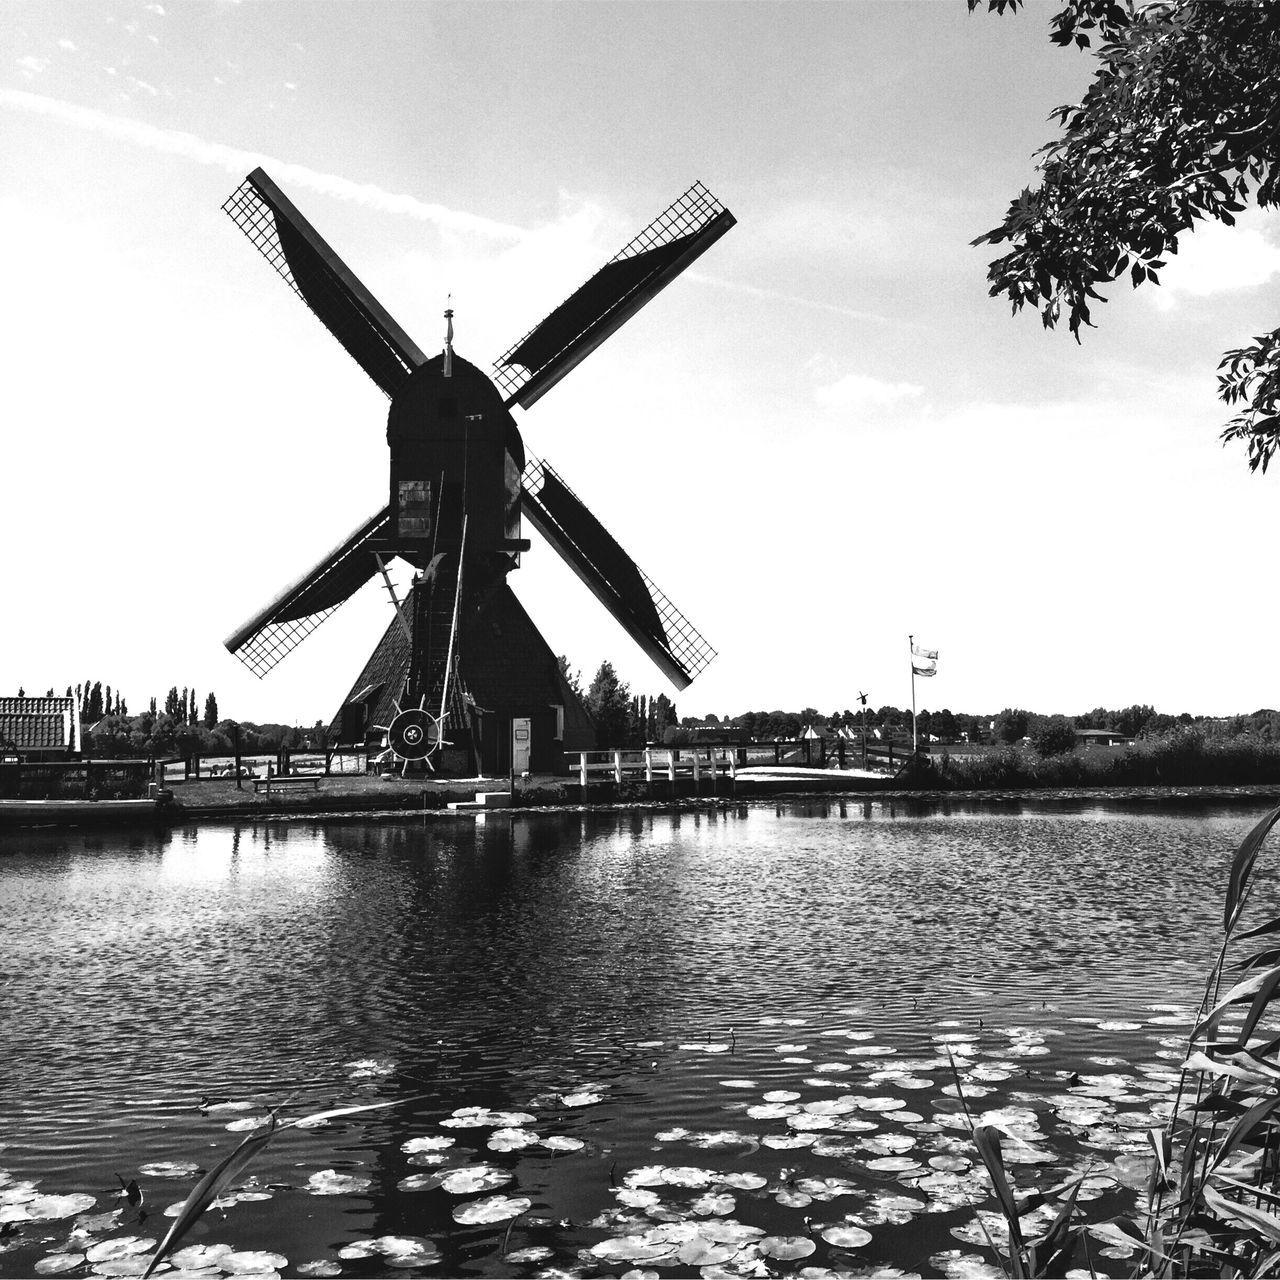 Windmill Blackandwhite Renewable Energy Architecture Blackandwhite Photography